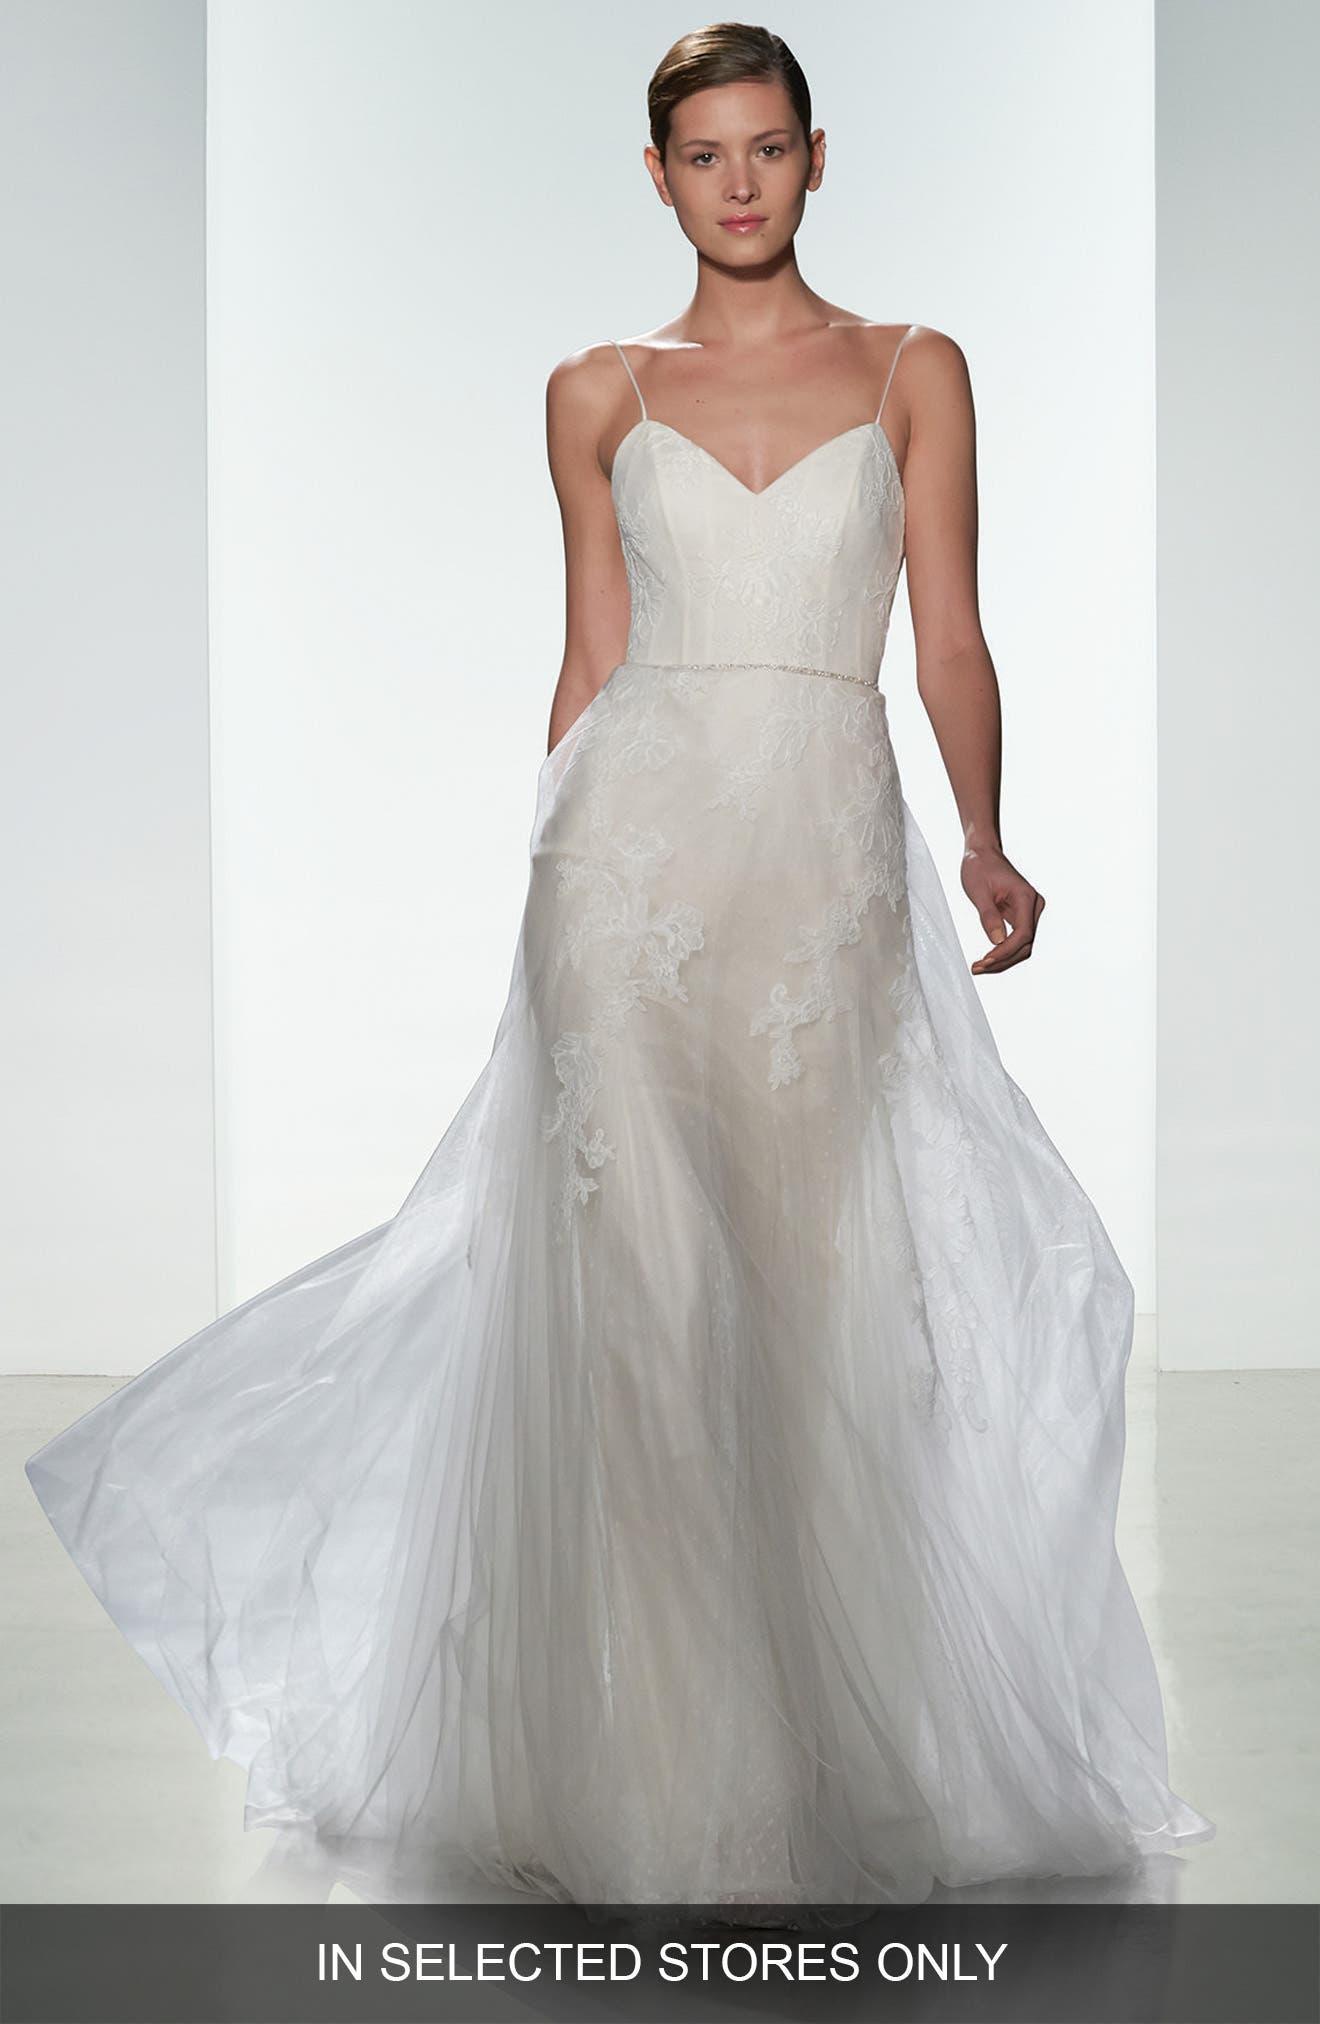 Main Image - Christos Bridal Effie Point dEsprit & Tulle Spaghetti Strap Gown